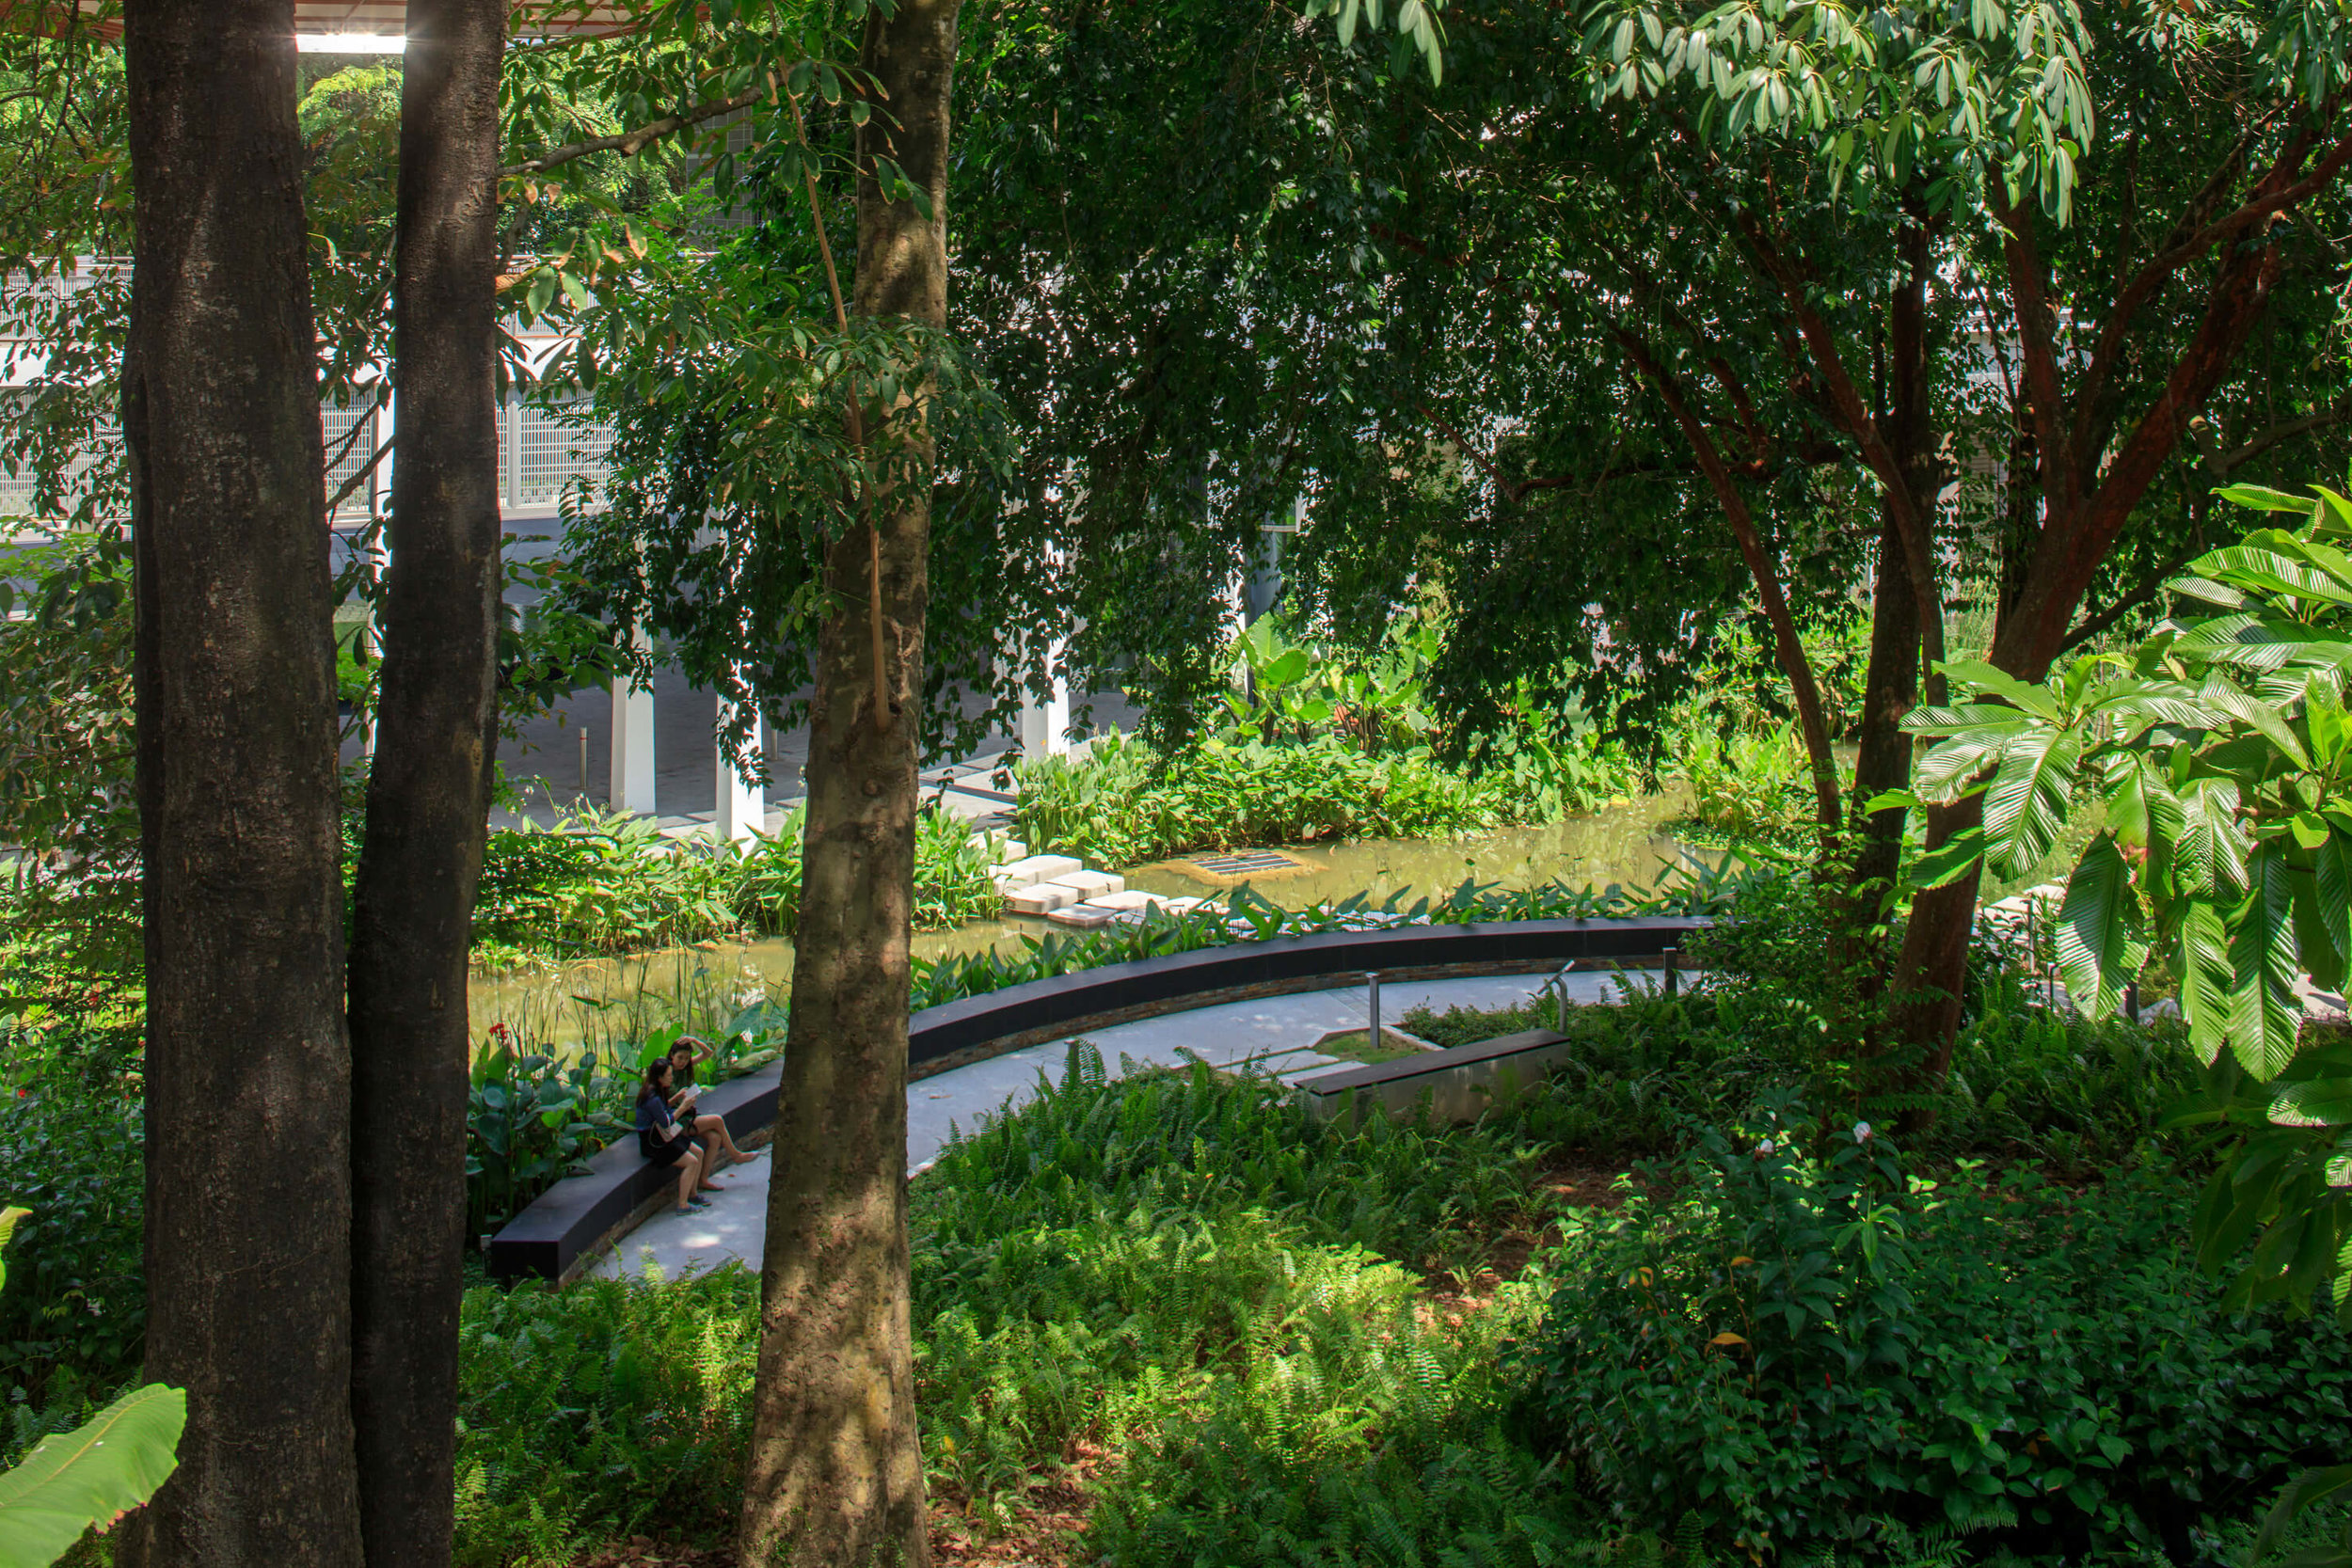 campus green bench - Copy.jpg